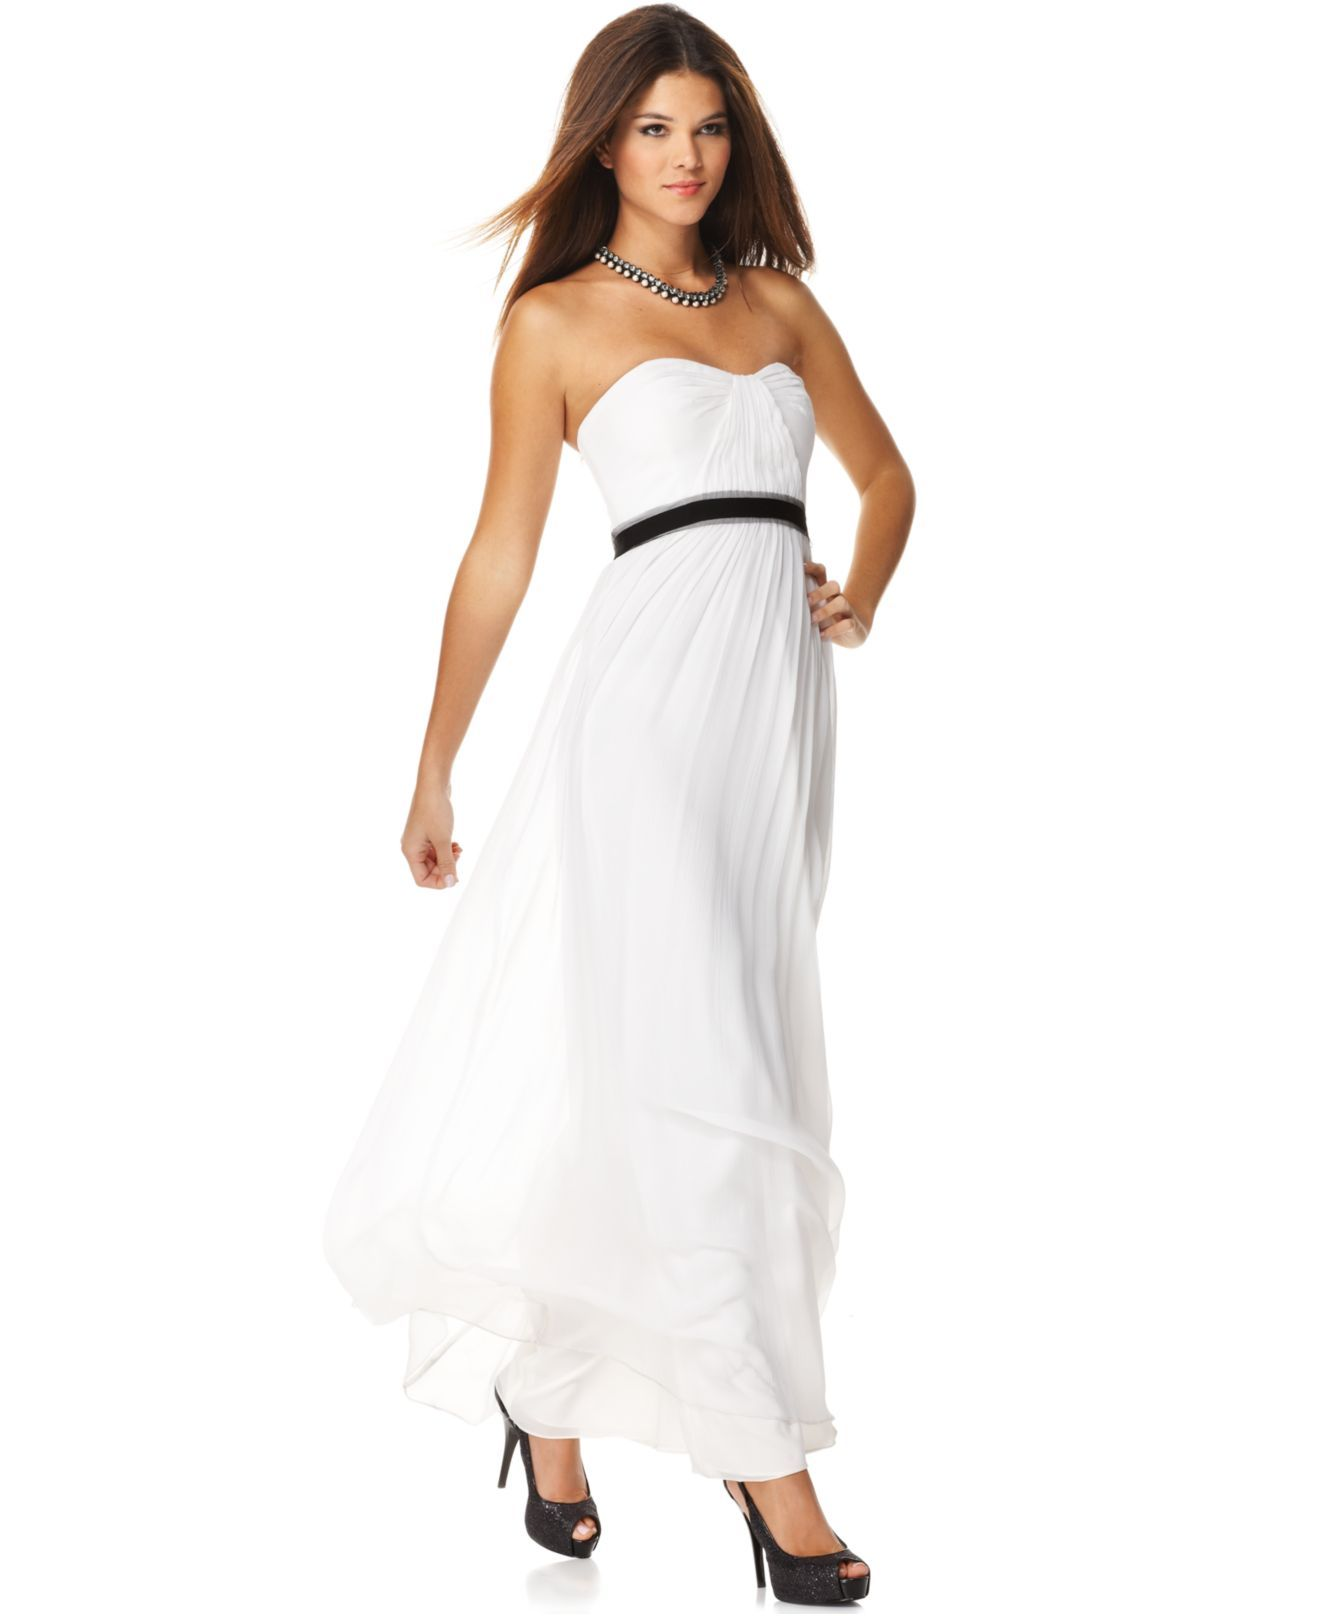 BCBGMAXAZRIA Dress, Strapless Empire Waist Evening Gown